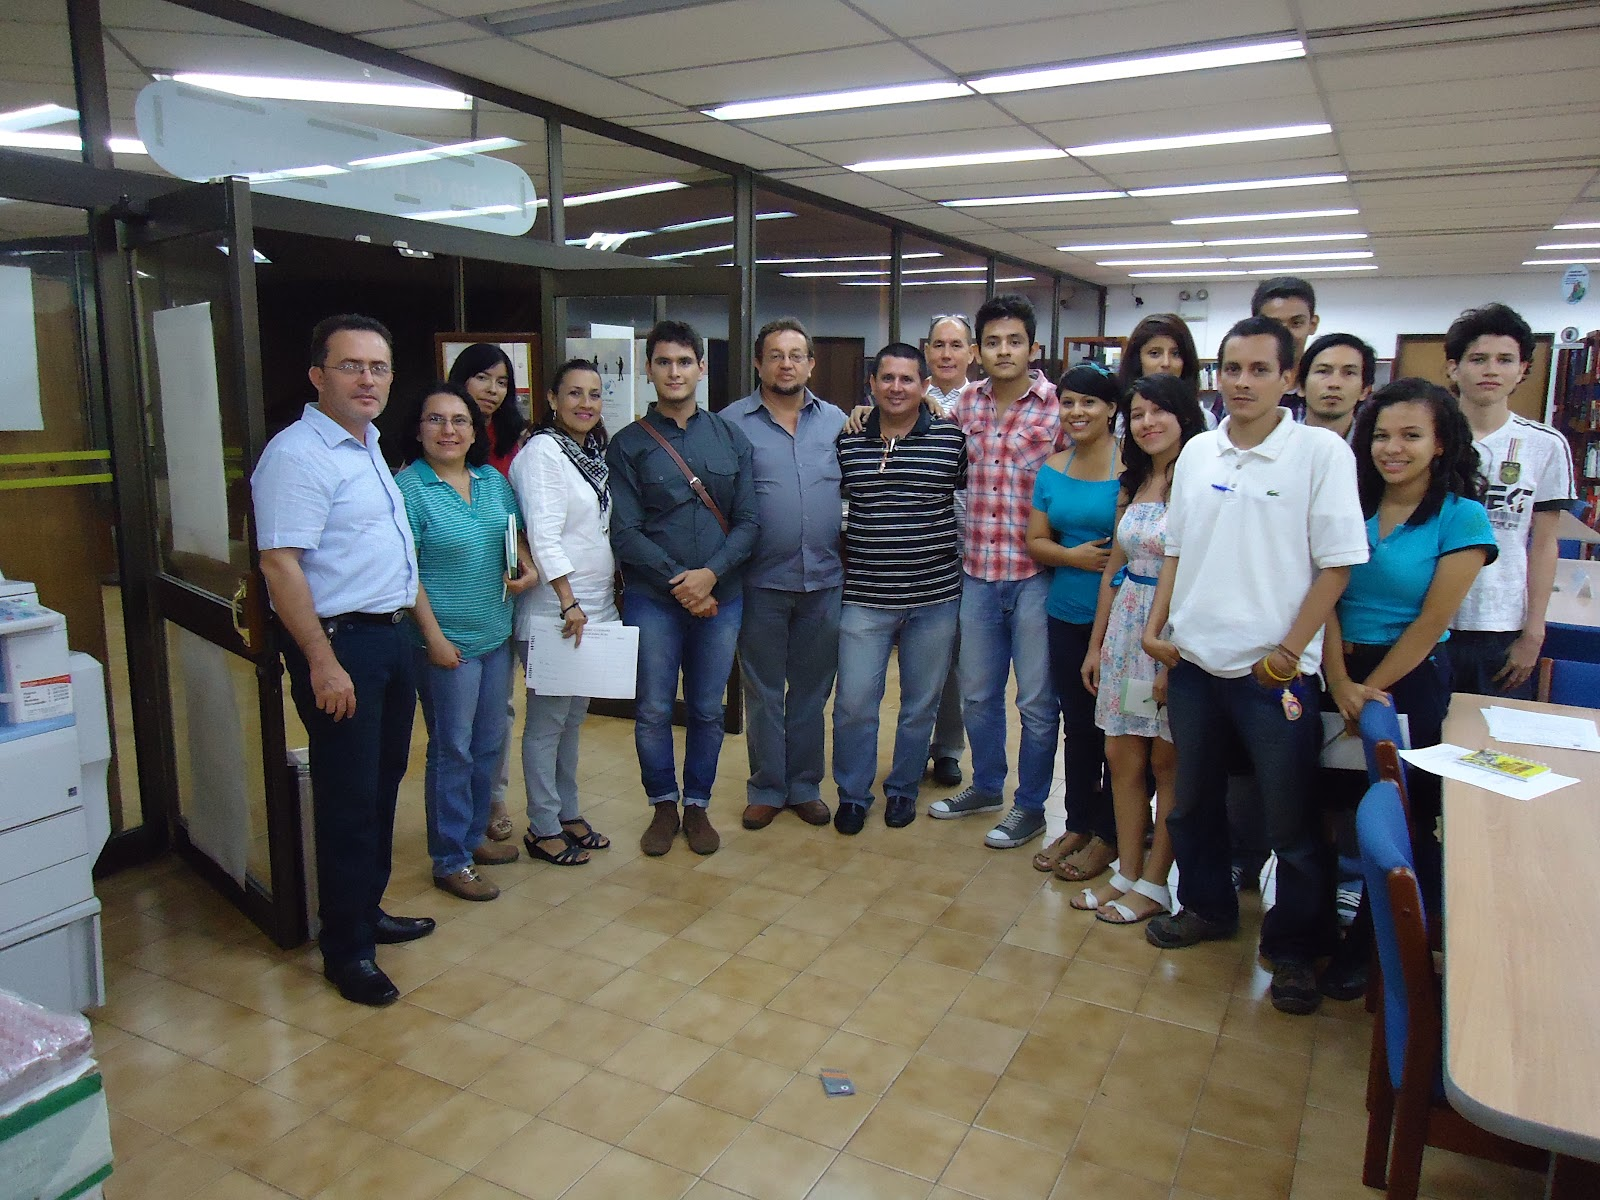 Betuel bonilla rojas visita a los talleres relata c cuta for Oficinas banco popular pamplona